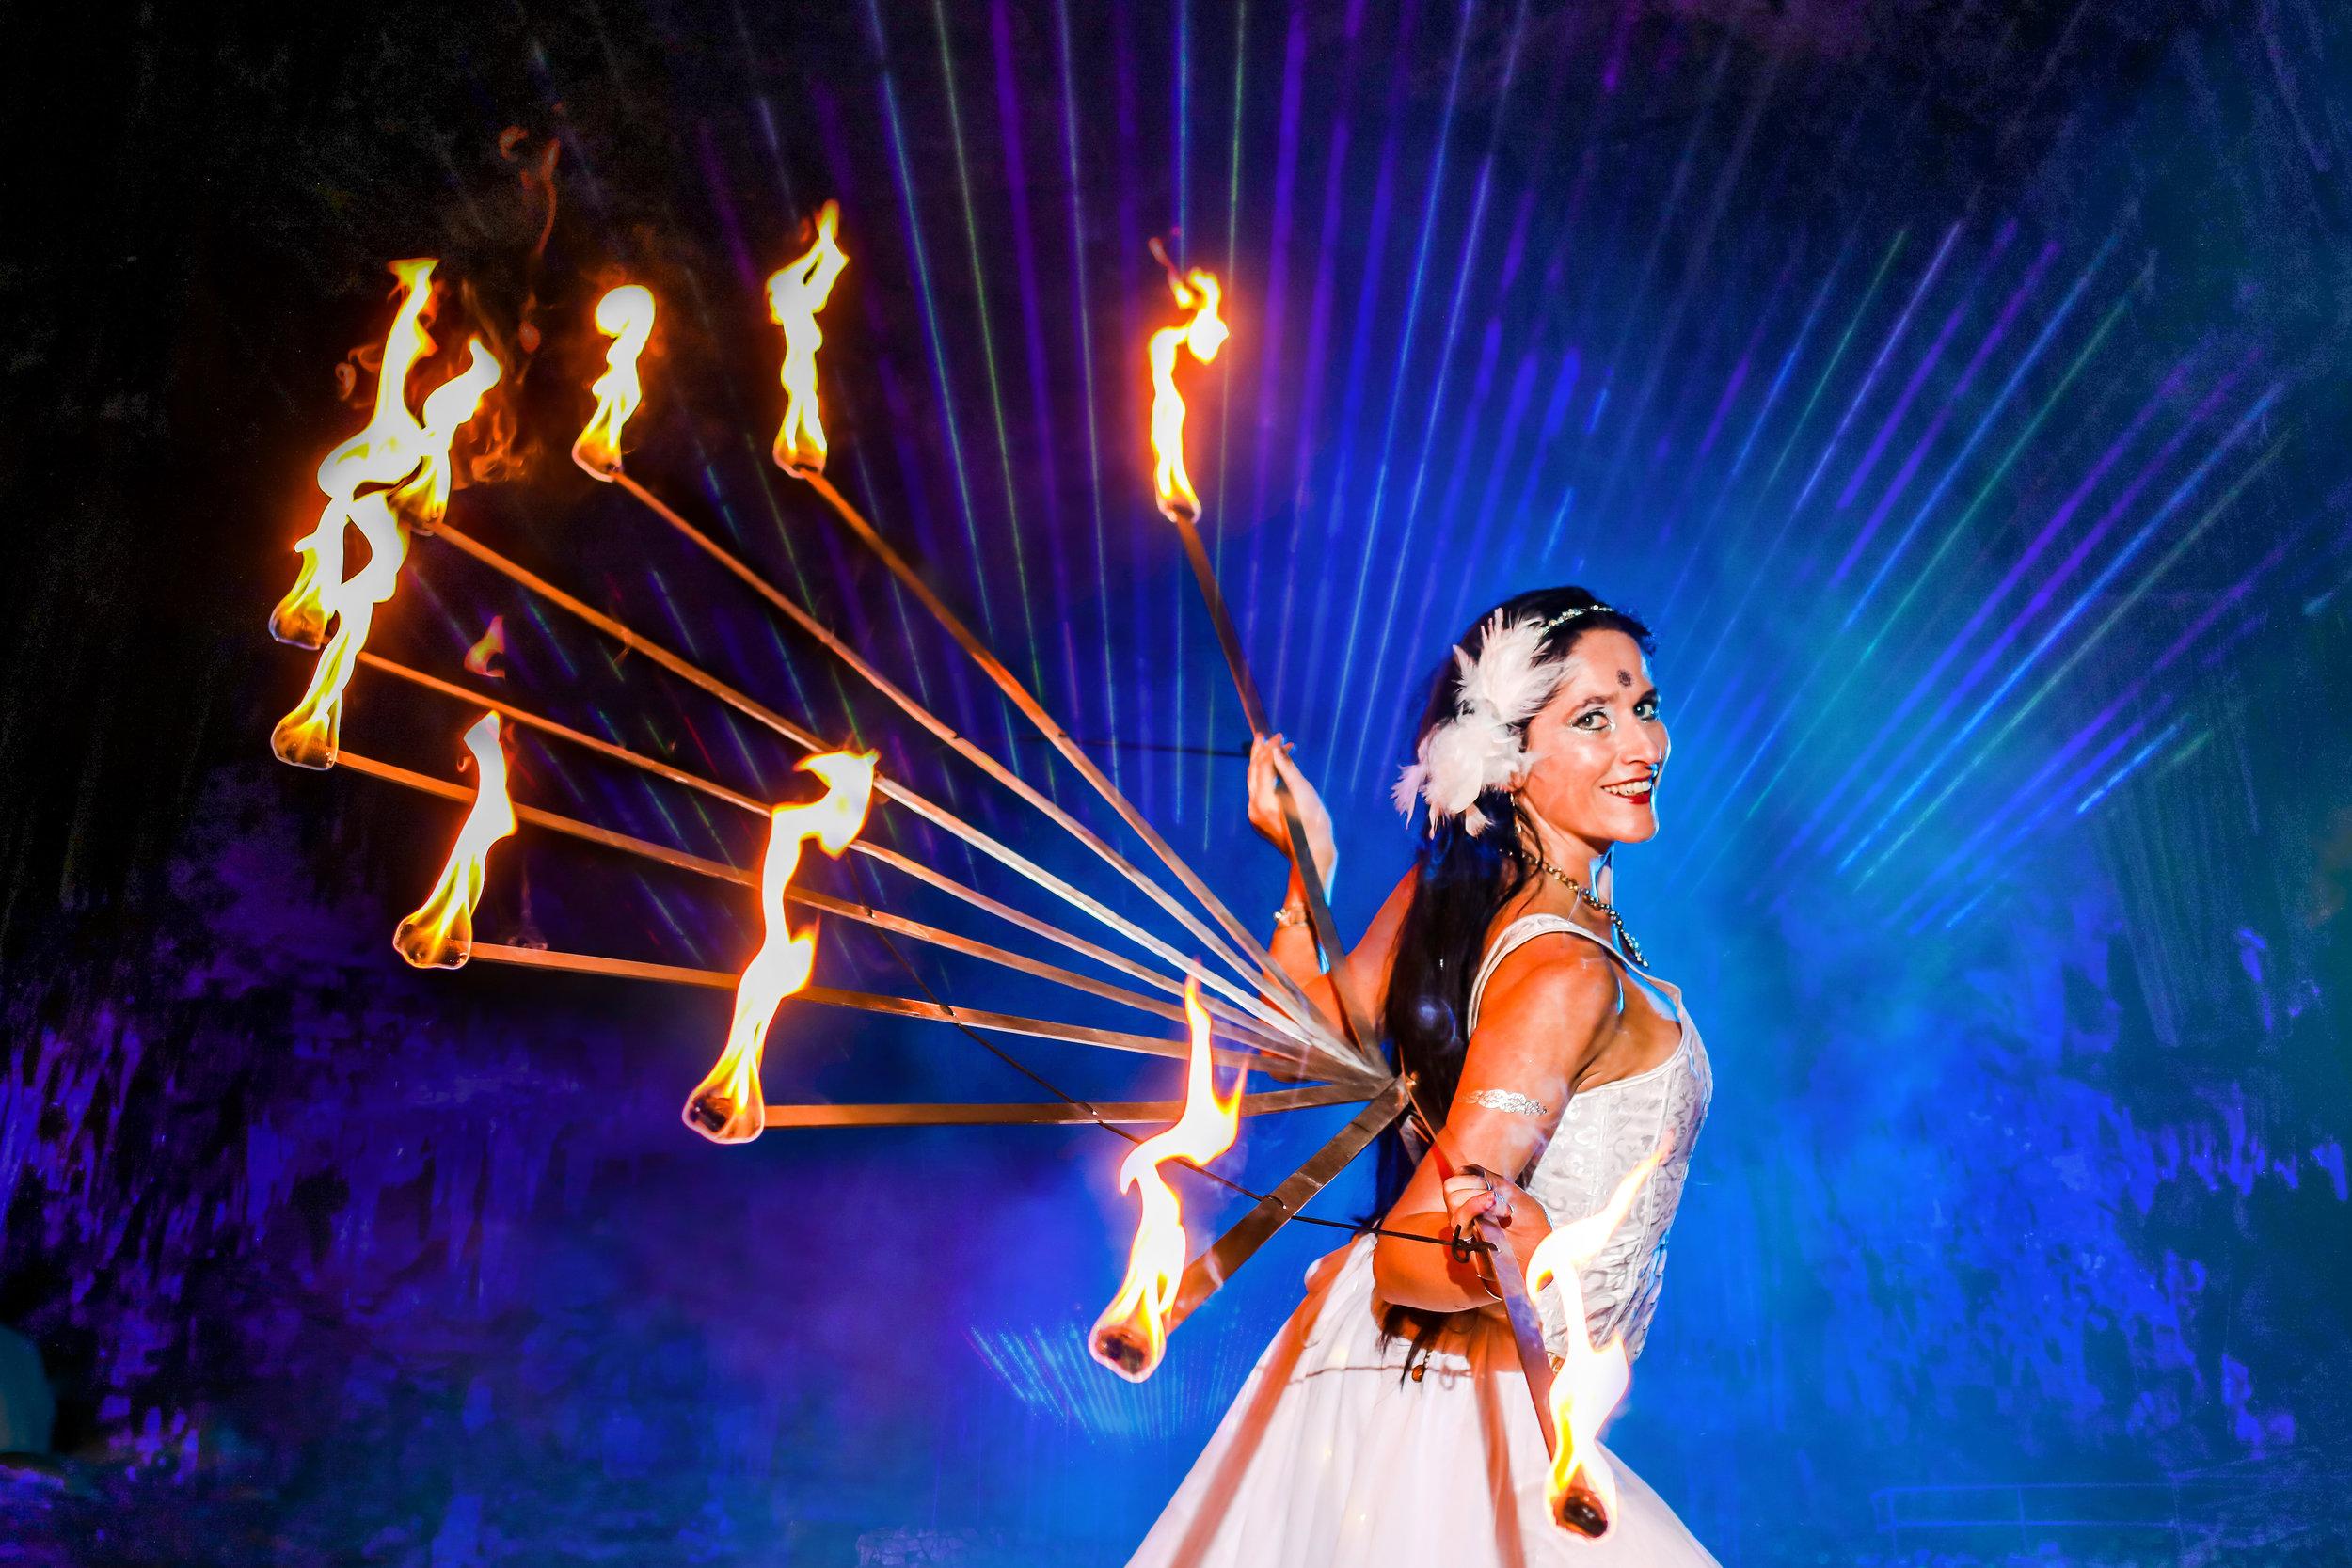 Manja Fire Dancer-0829new.jpg